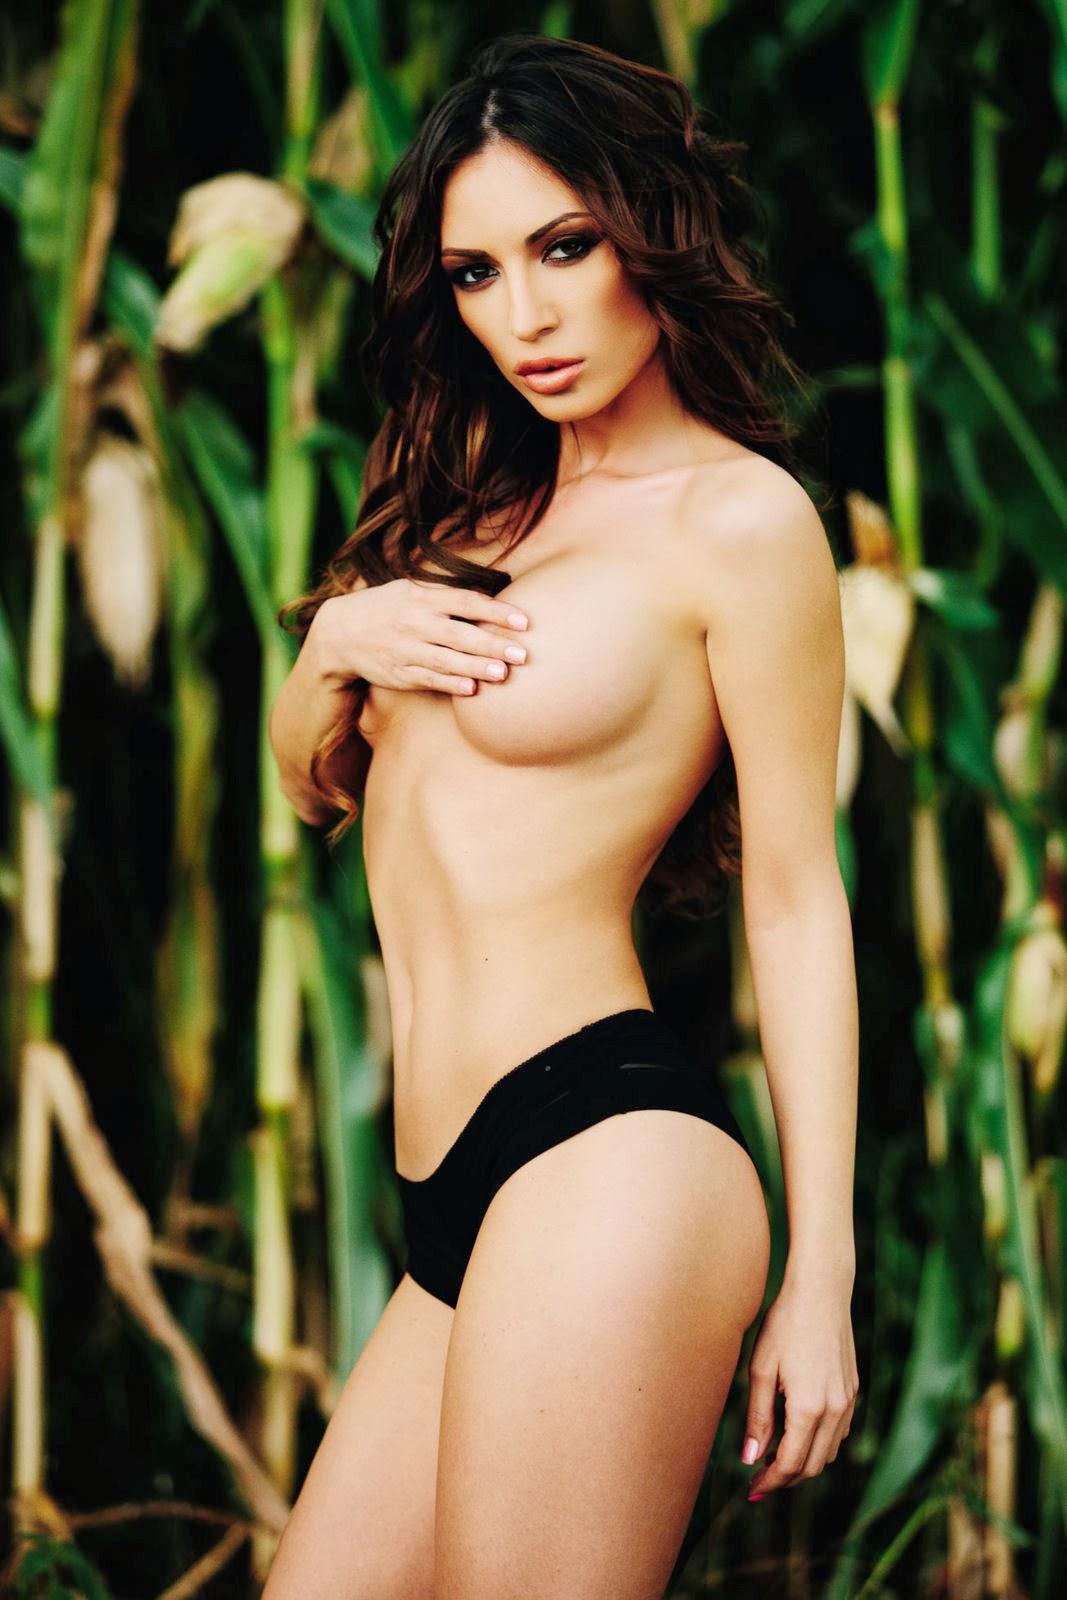 Pictures Anastasija Budic nudes (56 photos), Ass, Leaked, Feet, butt 2006